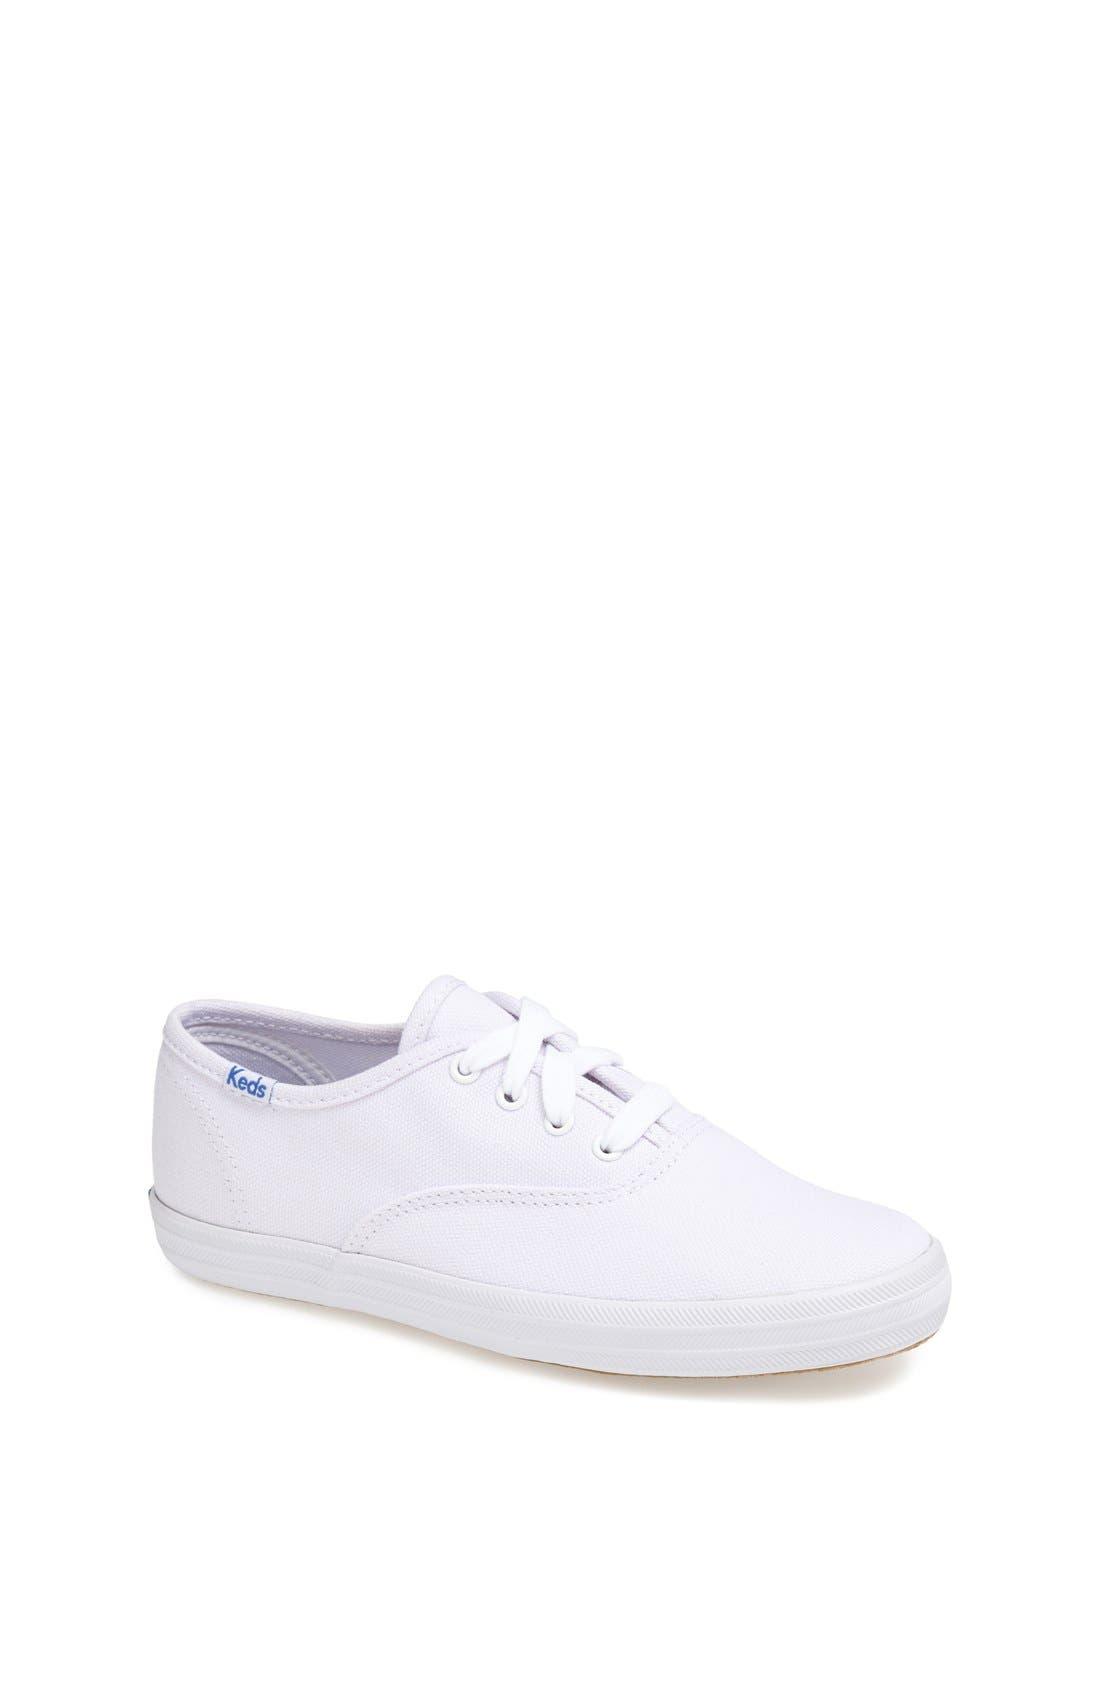 'Champion' Canvas Sneaker,                             Main thumbnail 1, color,                             NEW WHITE